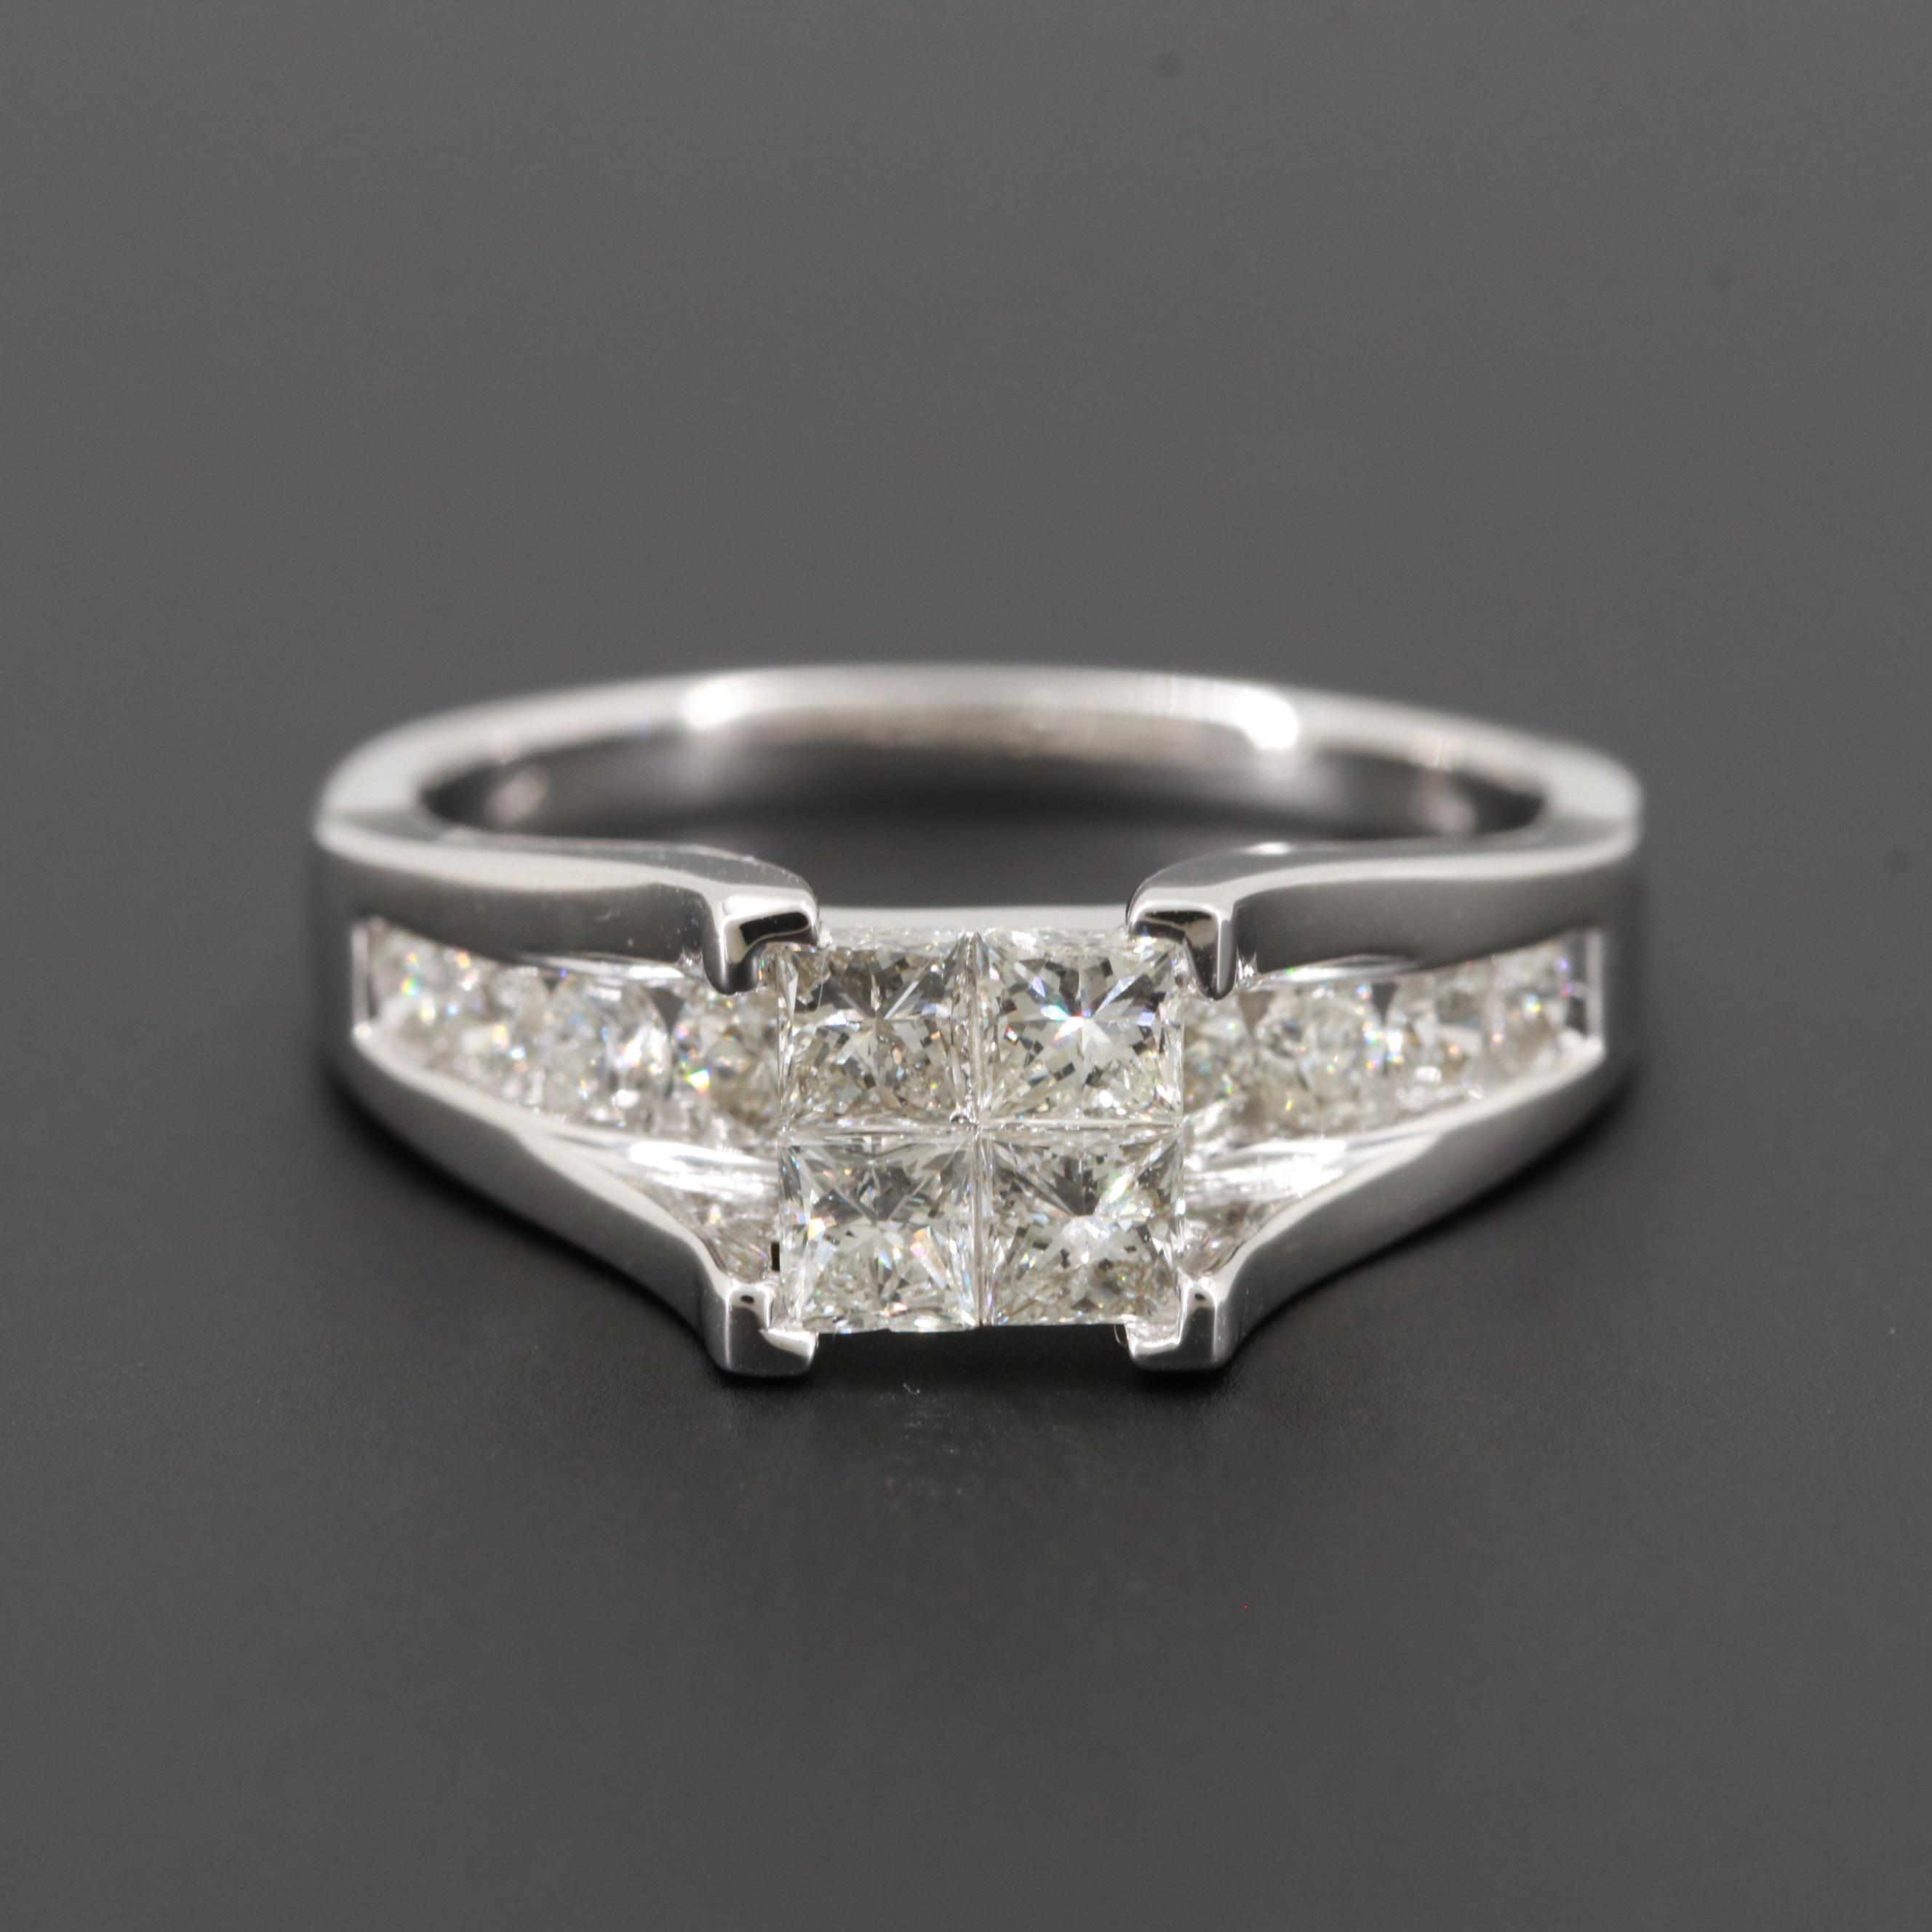 14K White Gold 1.48 CTW Diamond Ring